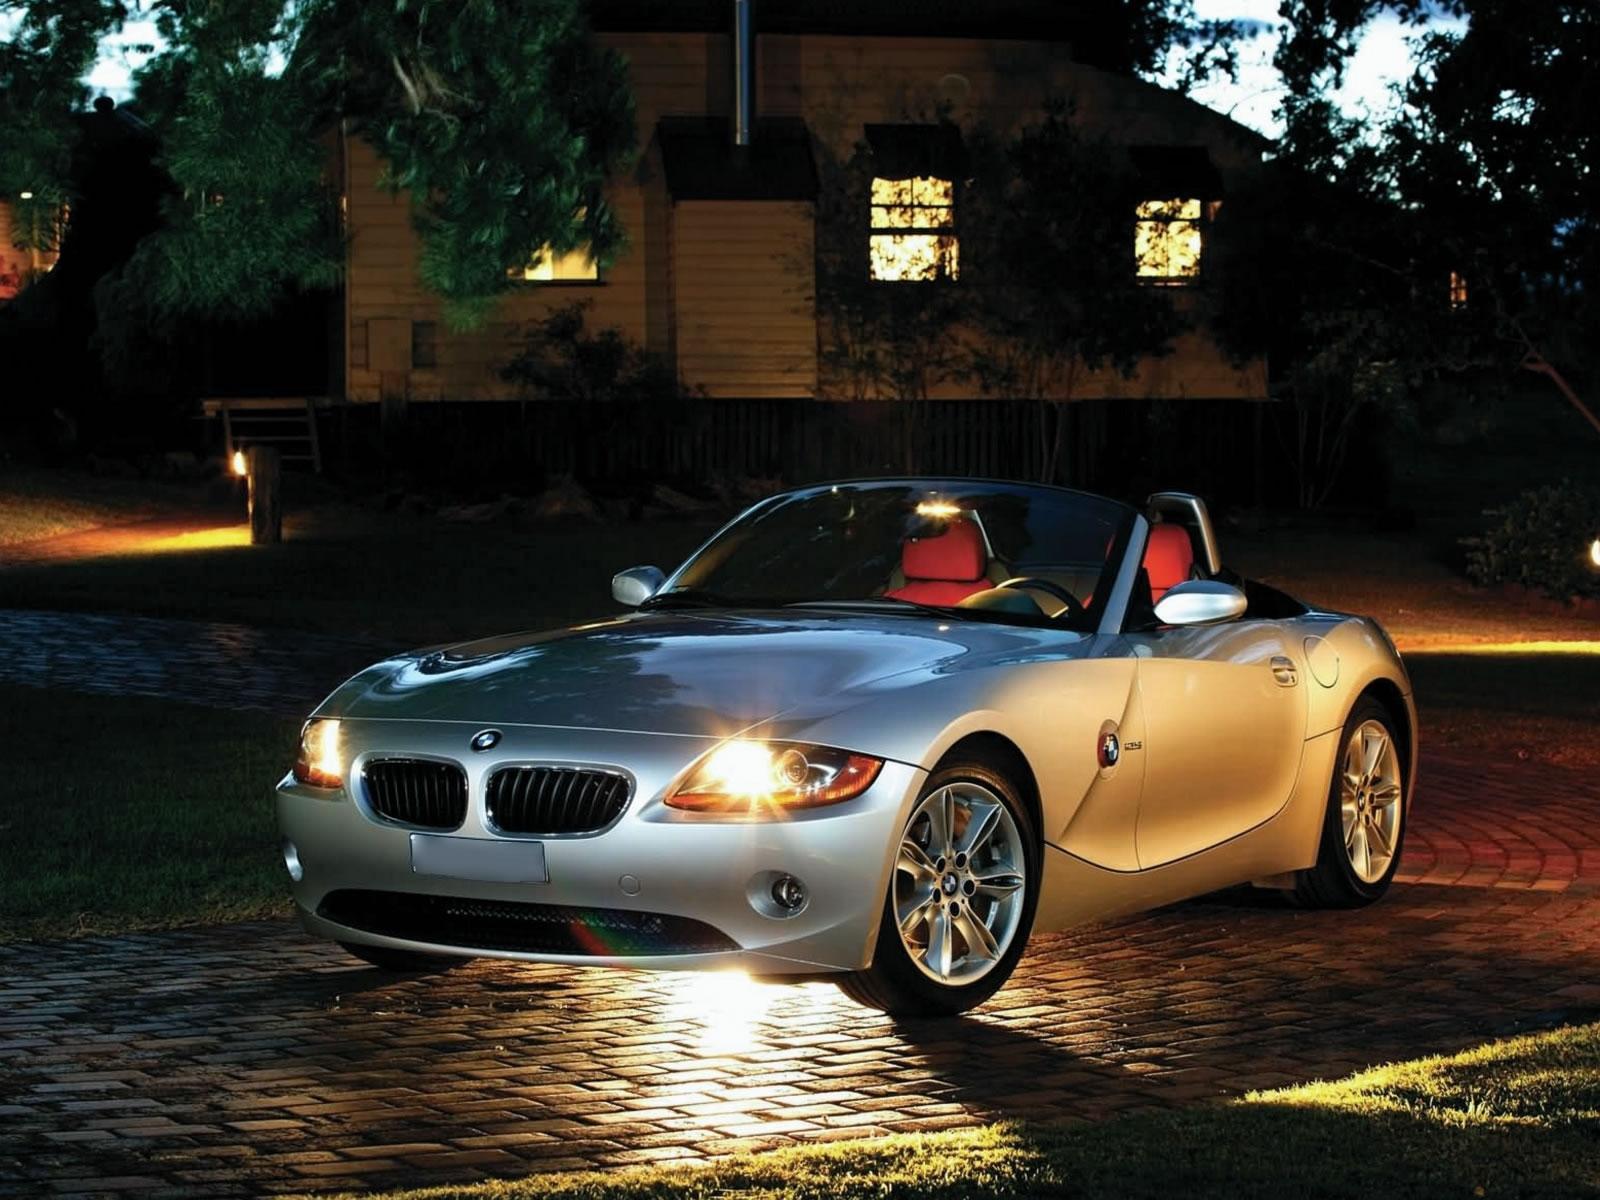 Desktop Wallpapers BMW BMW Z4 Cars auto automobile